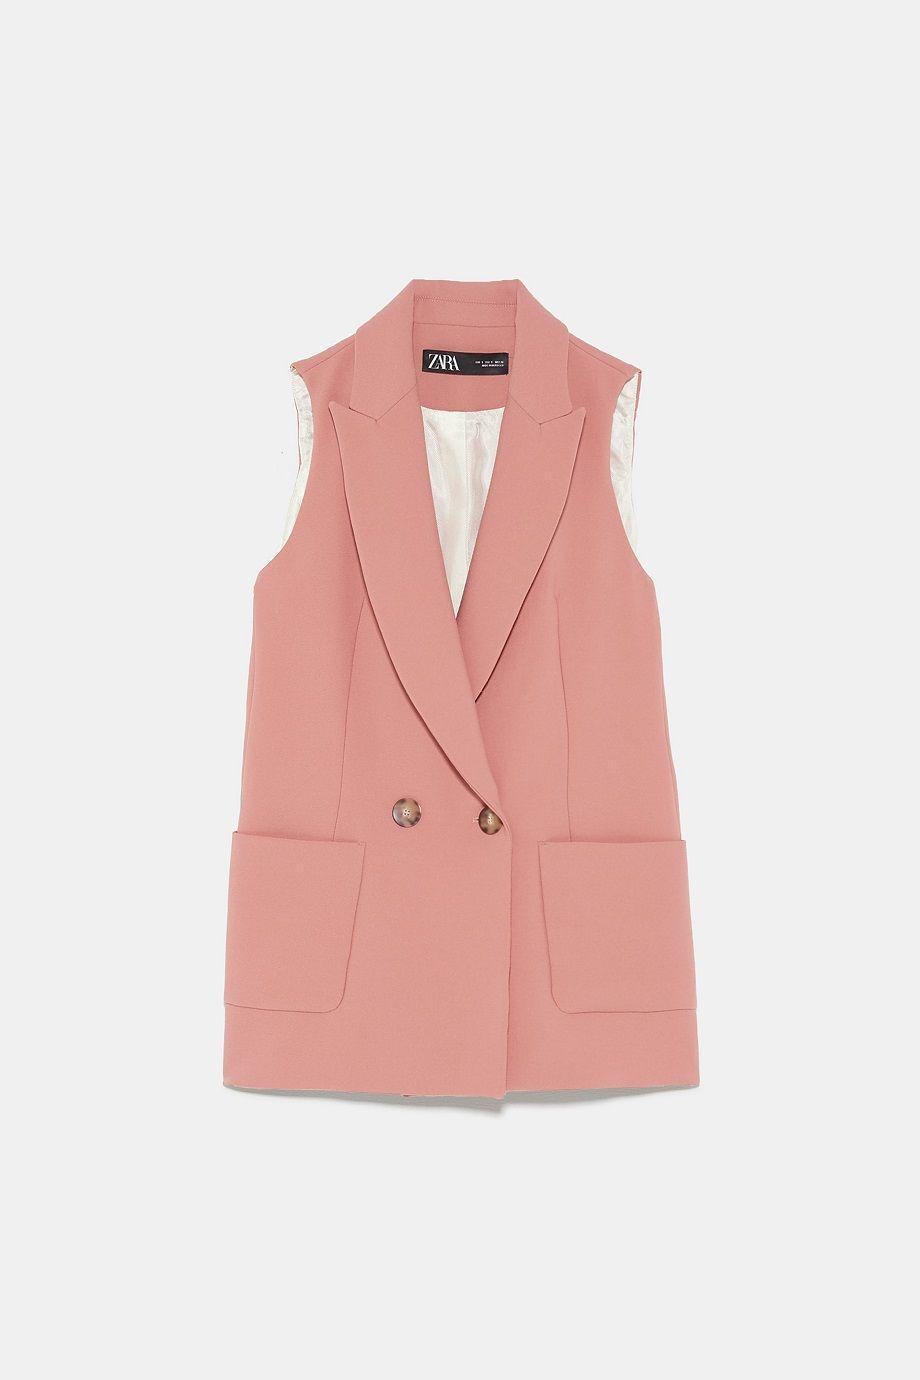 #PopbelaOOTD: Pakai Busana Pink untuk ke Kantor!